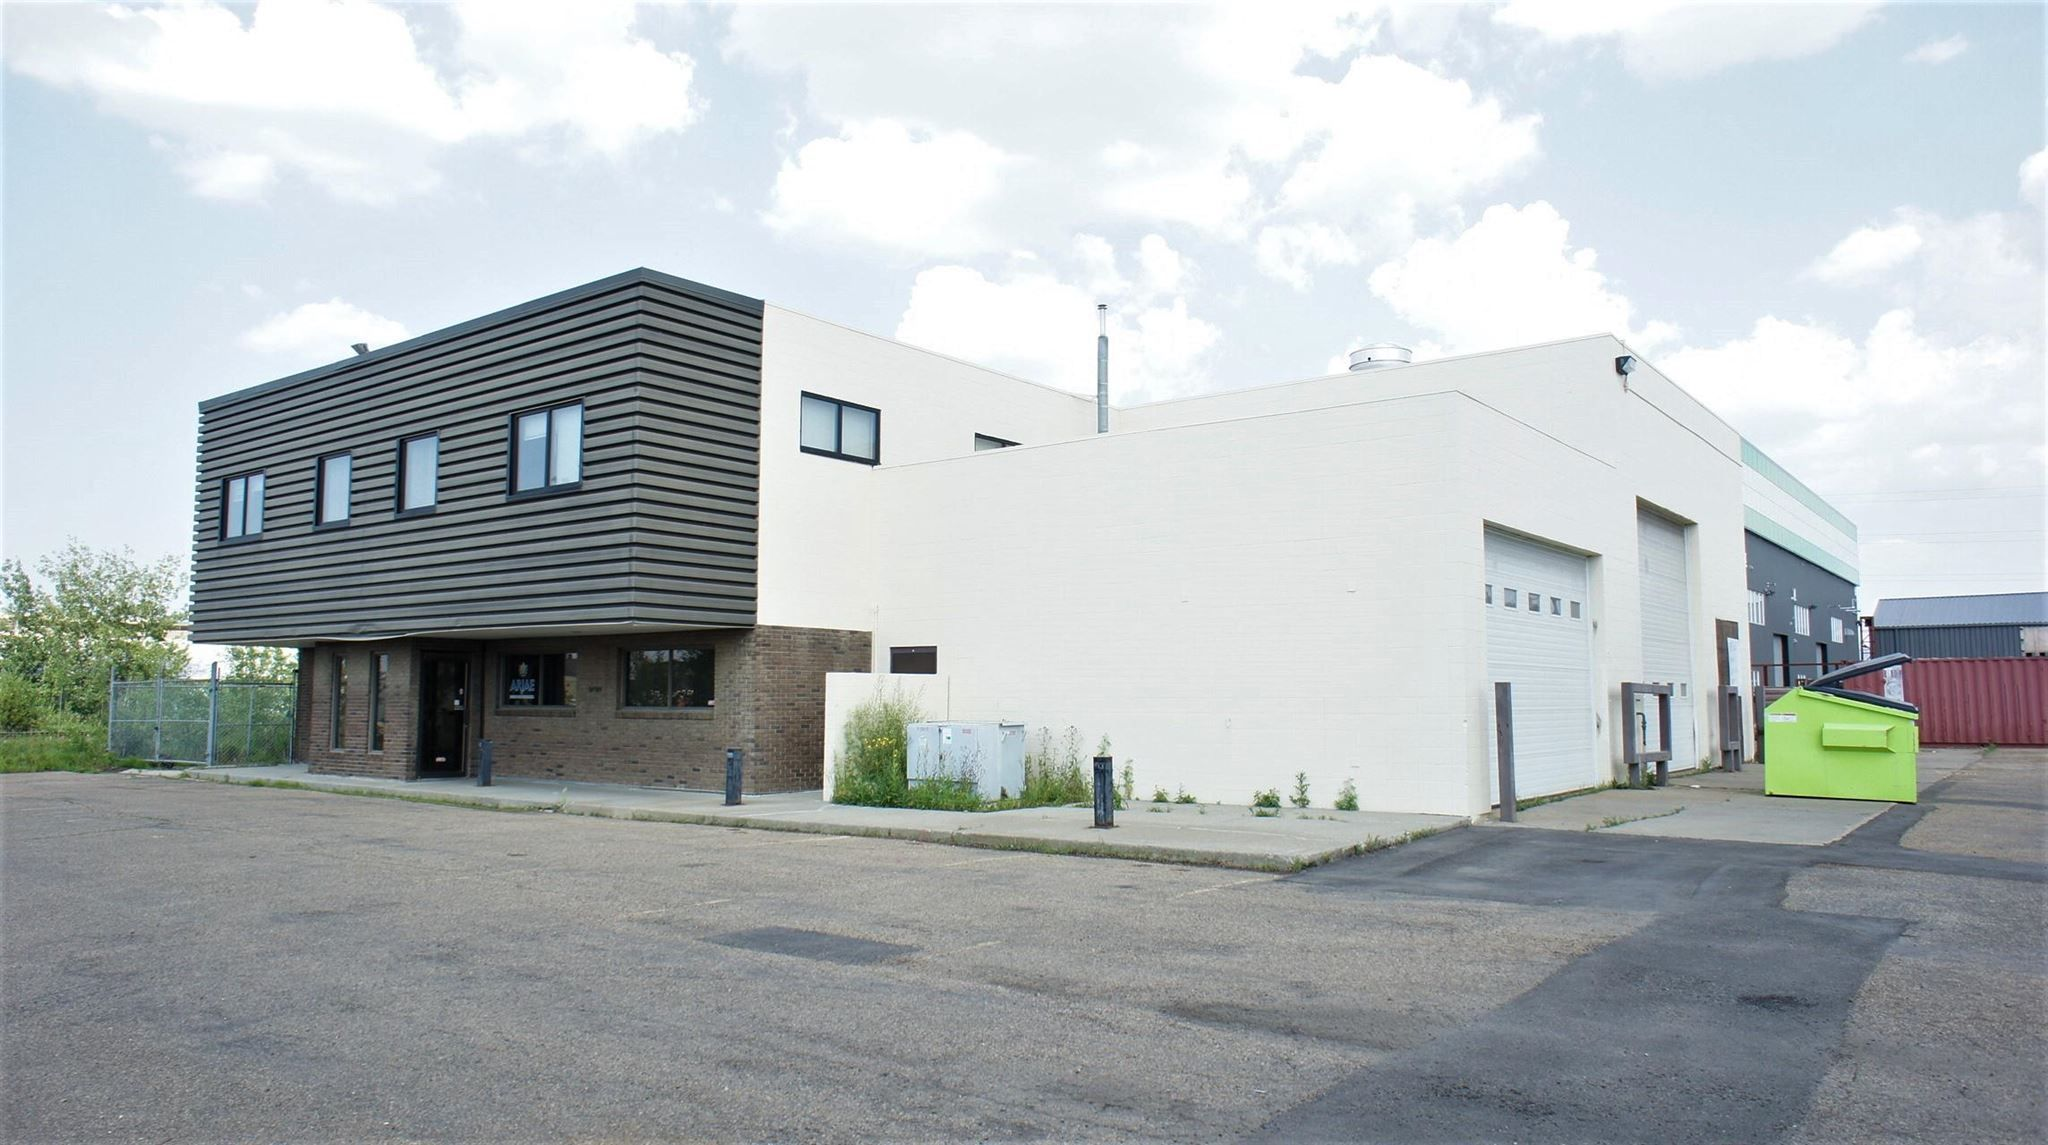 Main Photo: 9760 60 Avenue in Edmonton: Zone 41 Industrial for lease : MLS®# E4255047